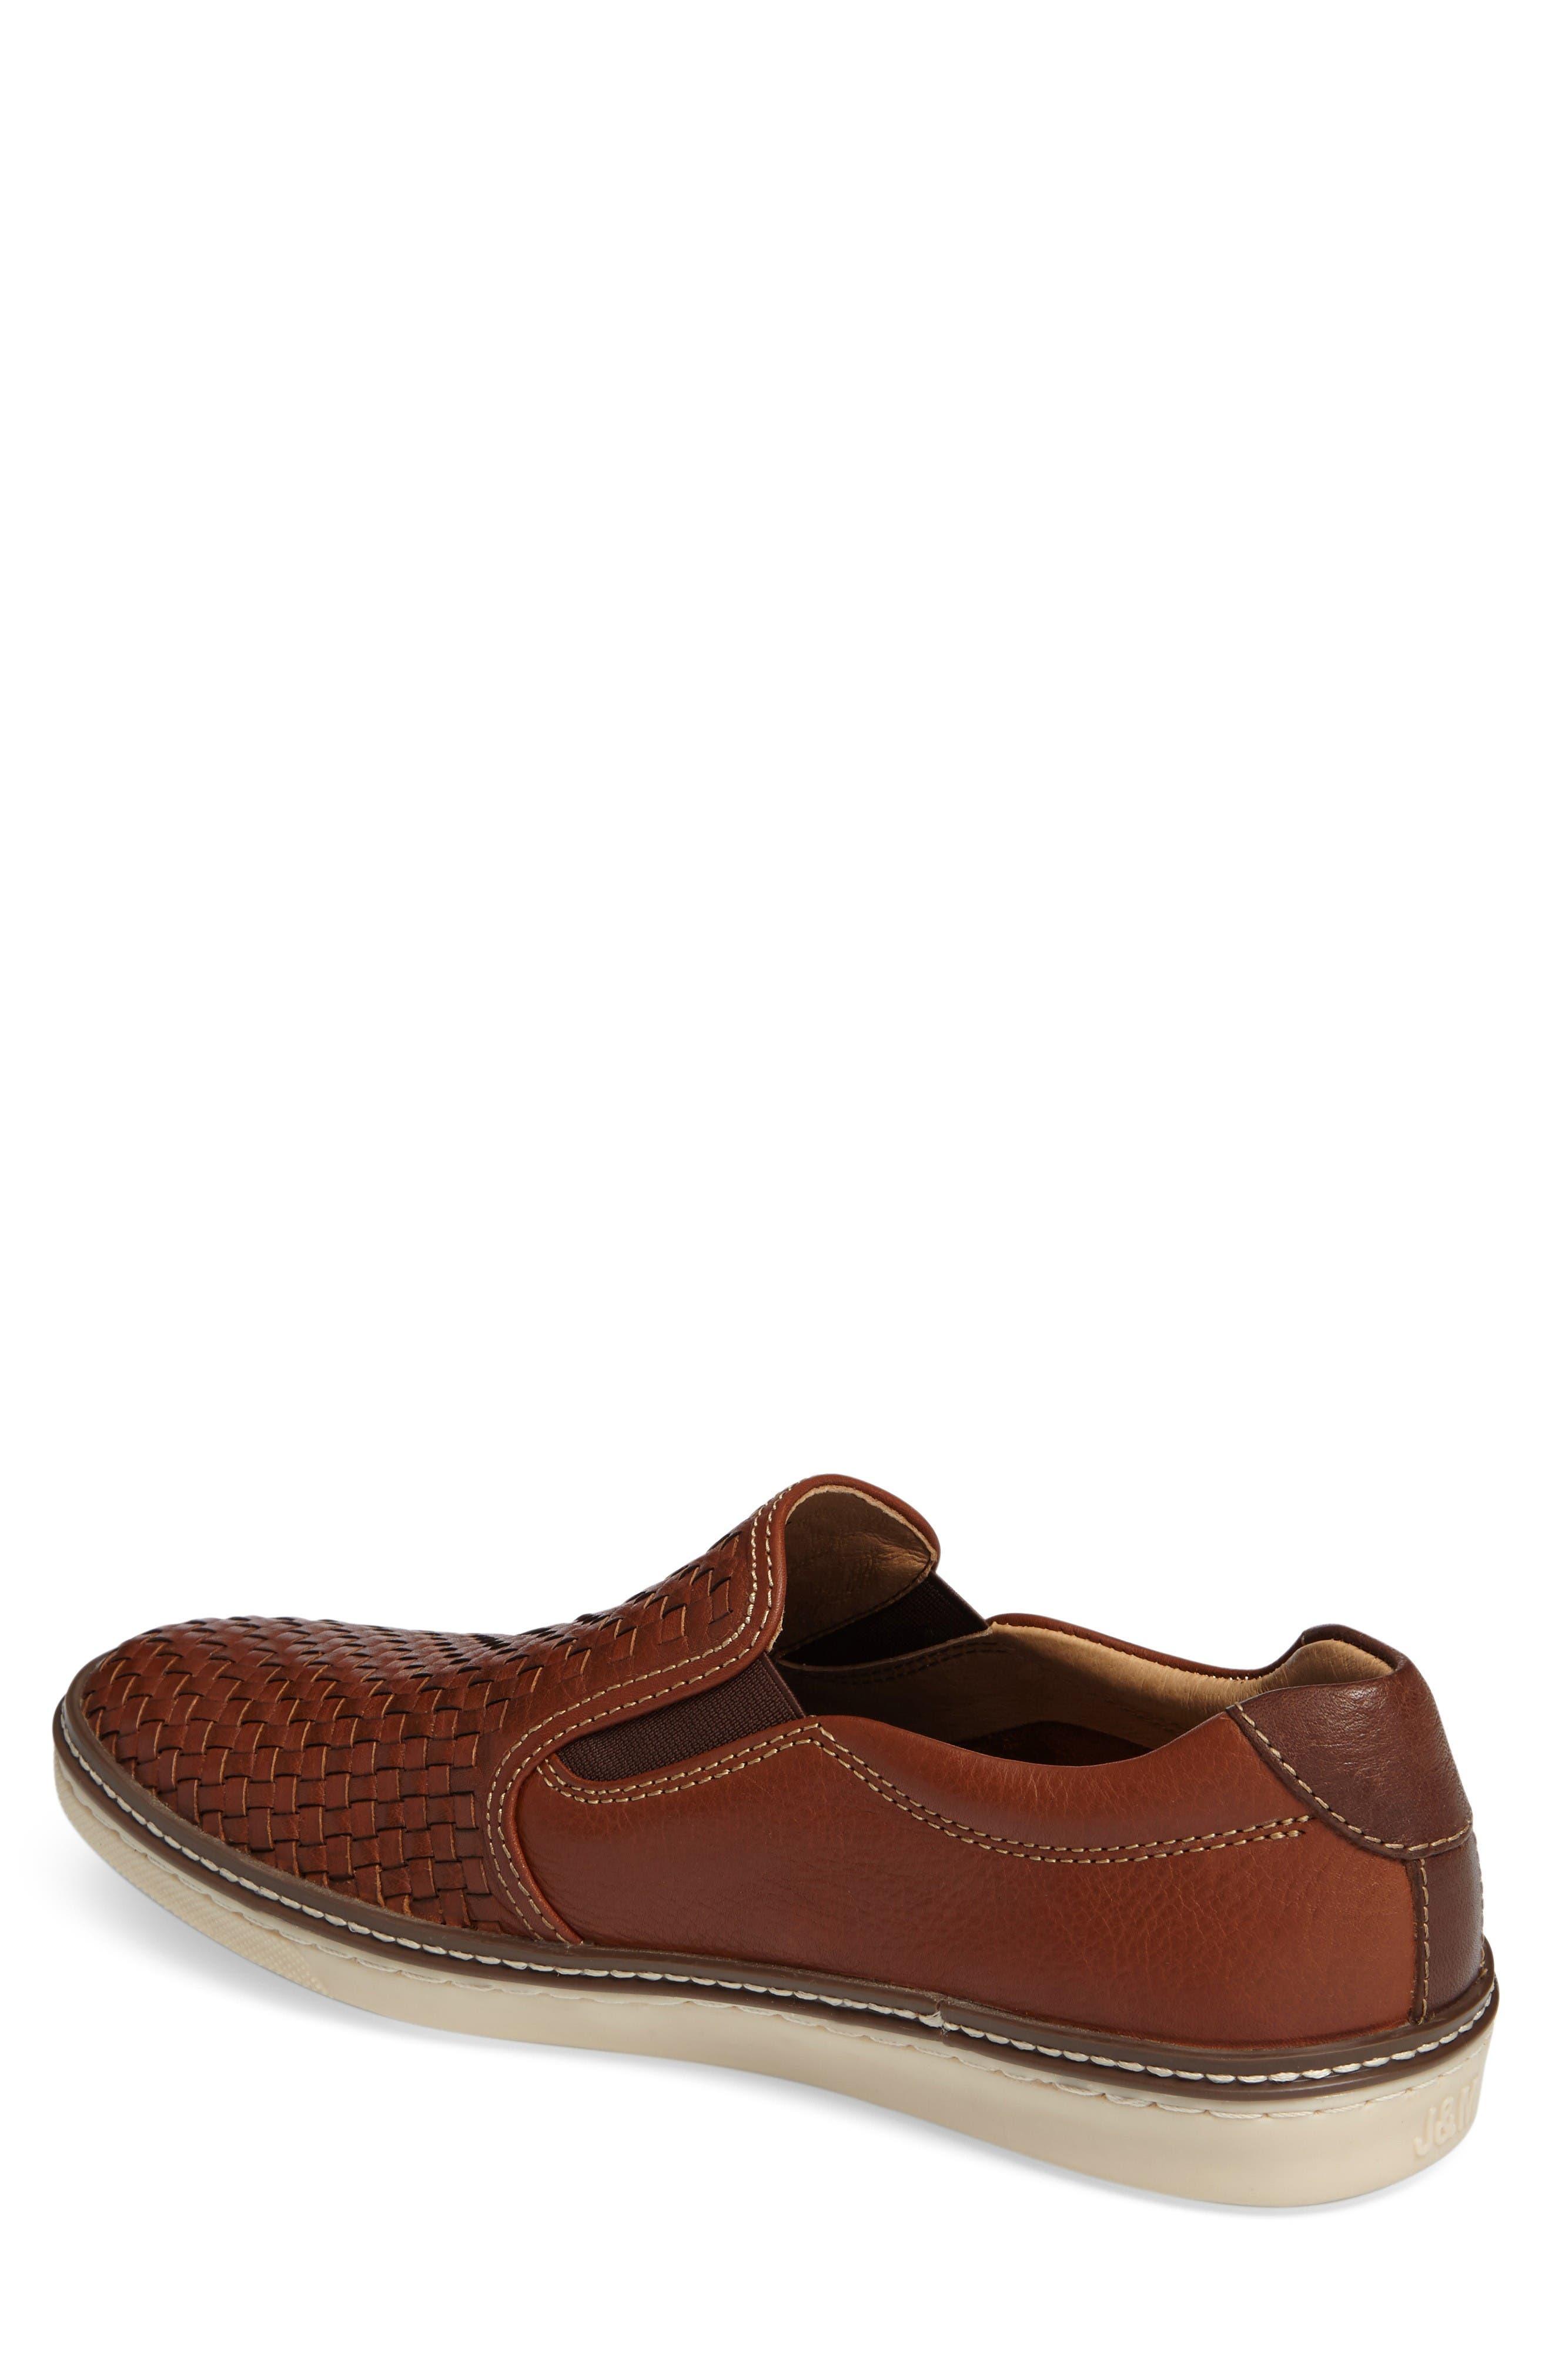 McGuffey Woven Slip-On Sneaker,                             Alternate thumbnail 2, color,                             Tan Leather